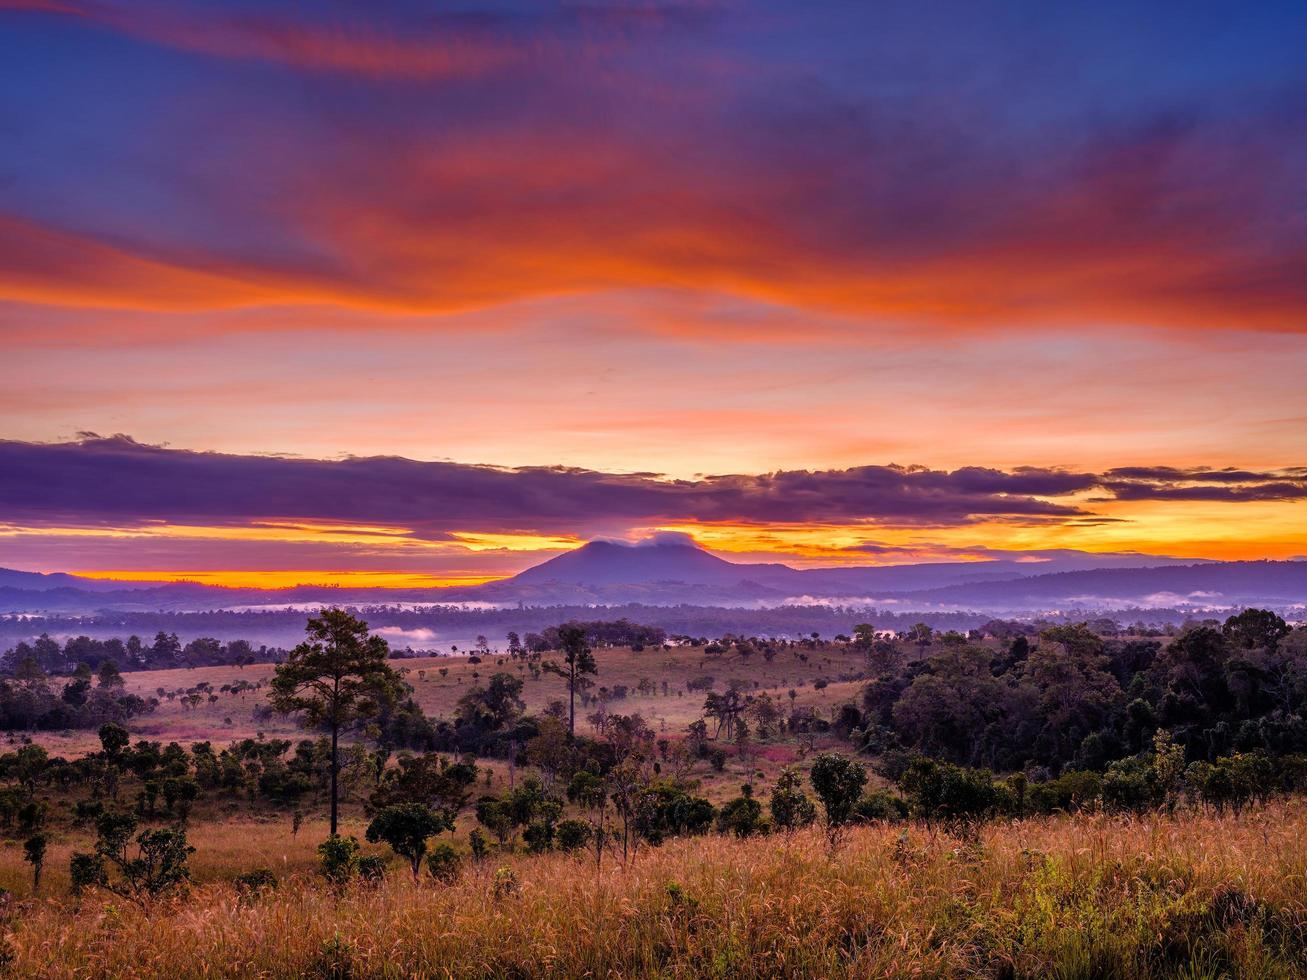 Blick auf Berge mit Sonnenuntergang Himmel foto